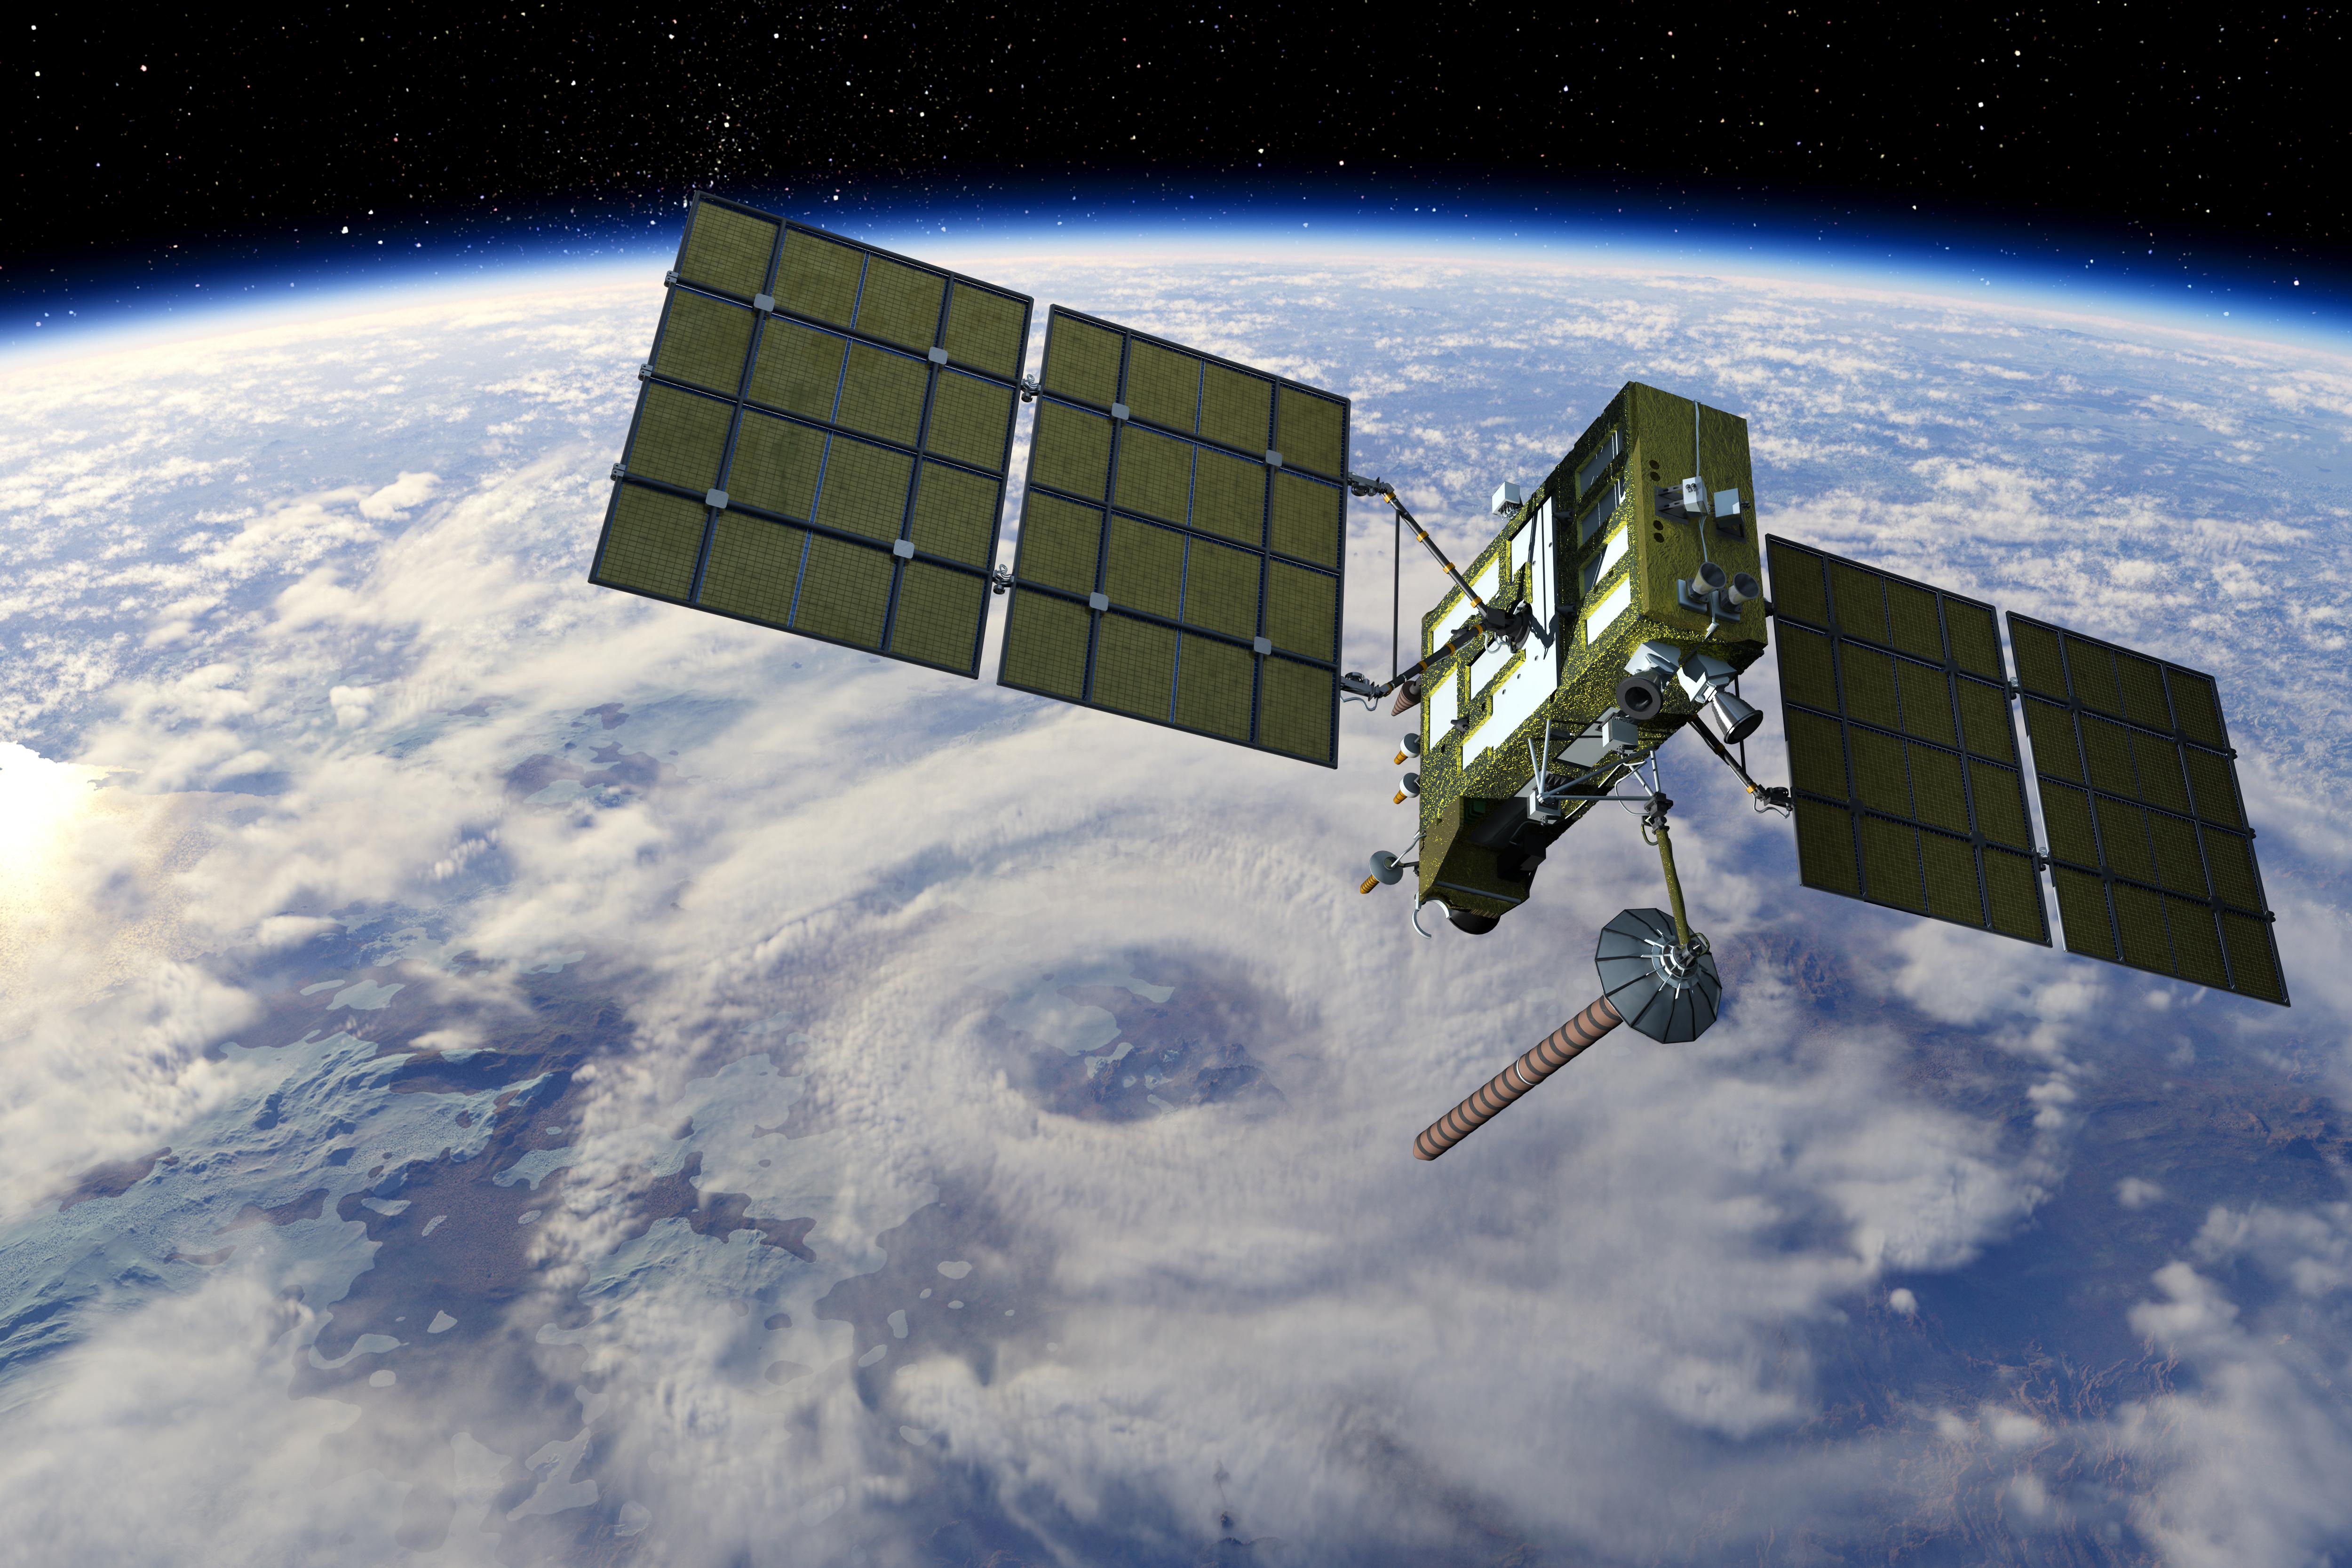 Modern GPS satellite. Image courtesy of Adobe Stock.